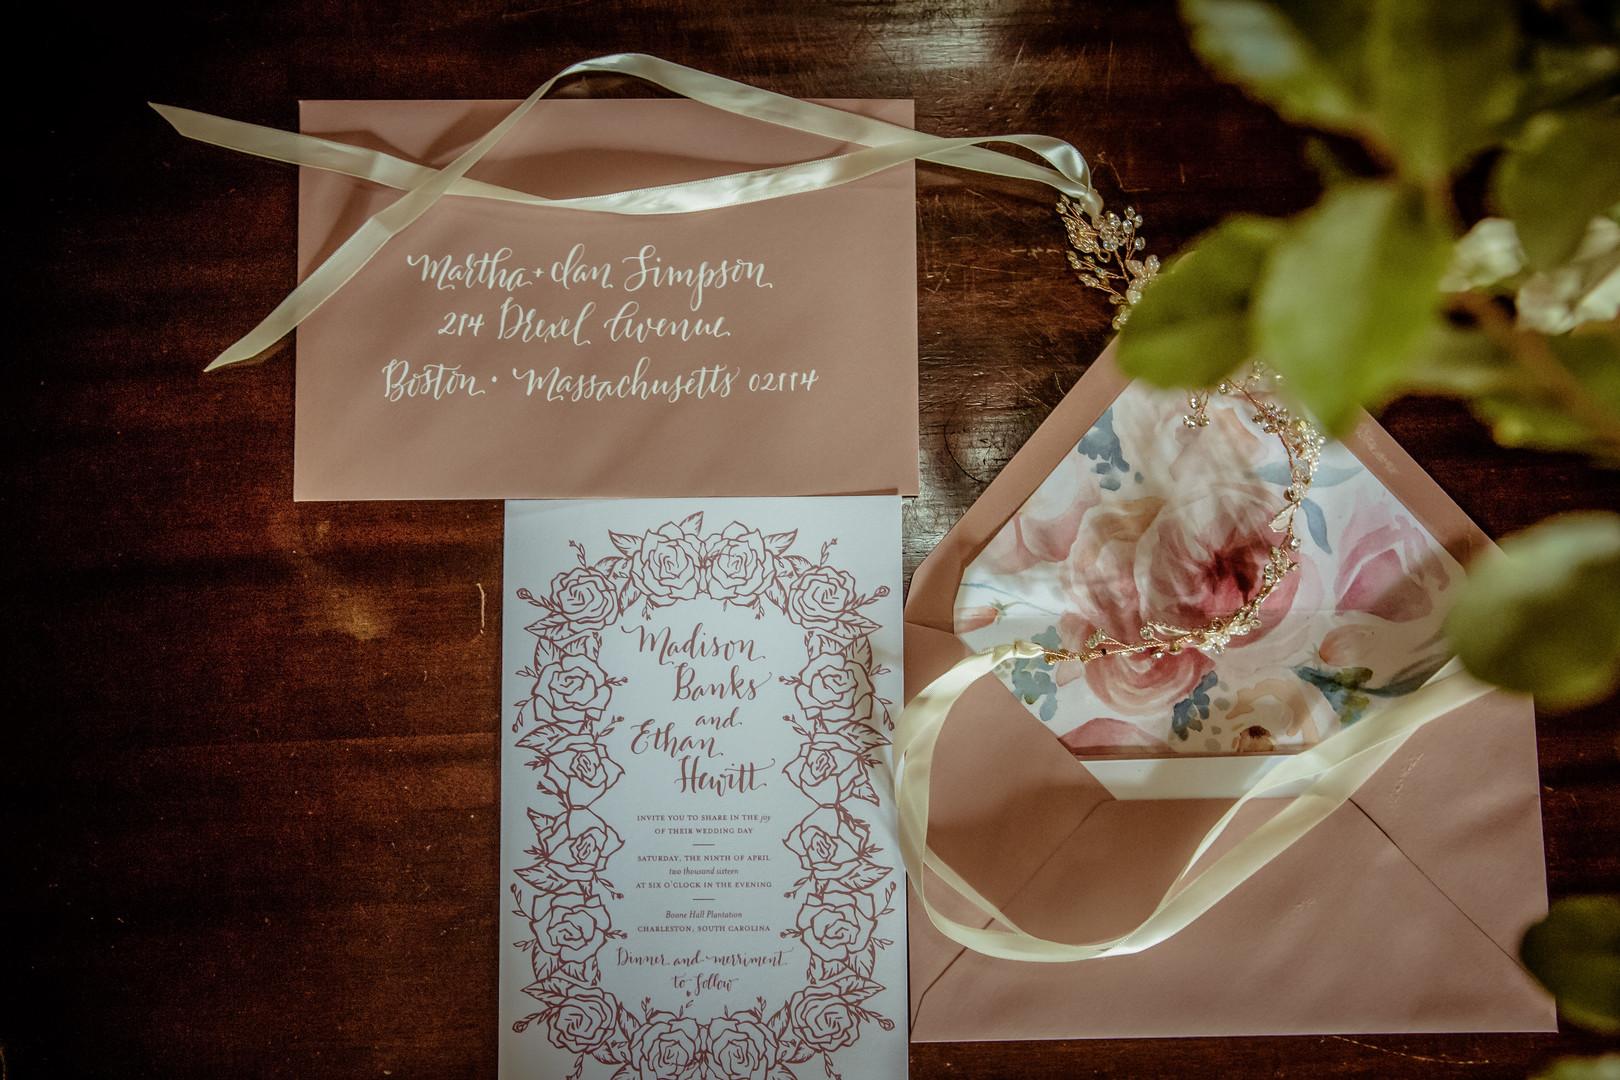 rose-hill-mansion-wedding-7.jpg